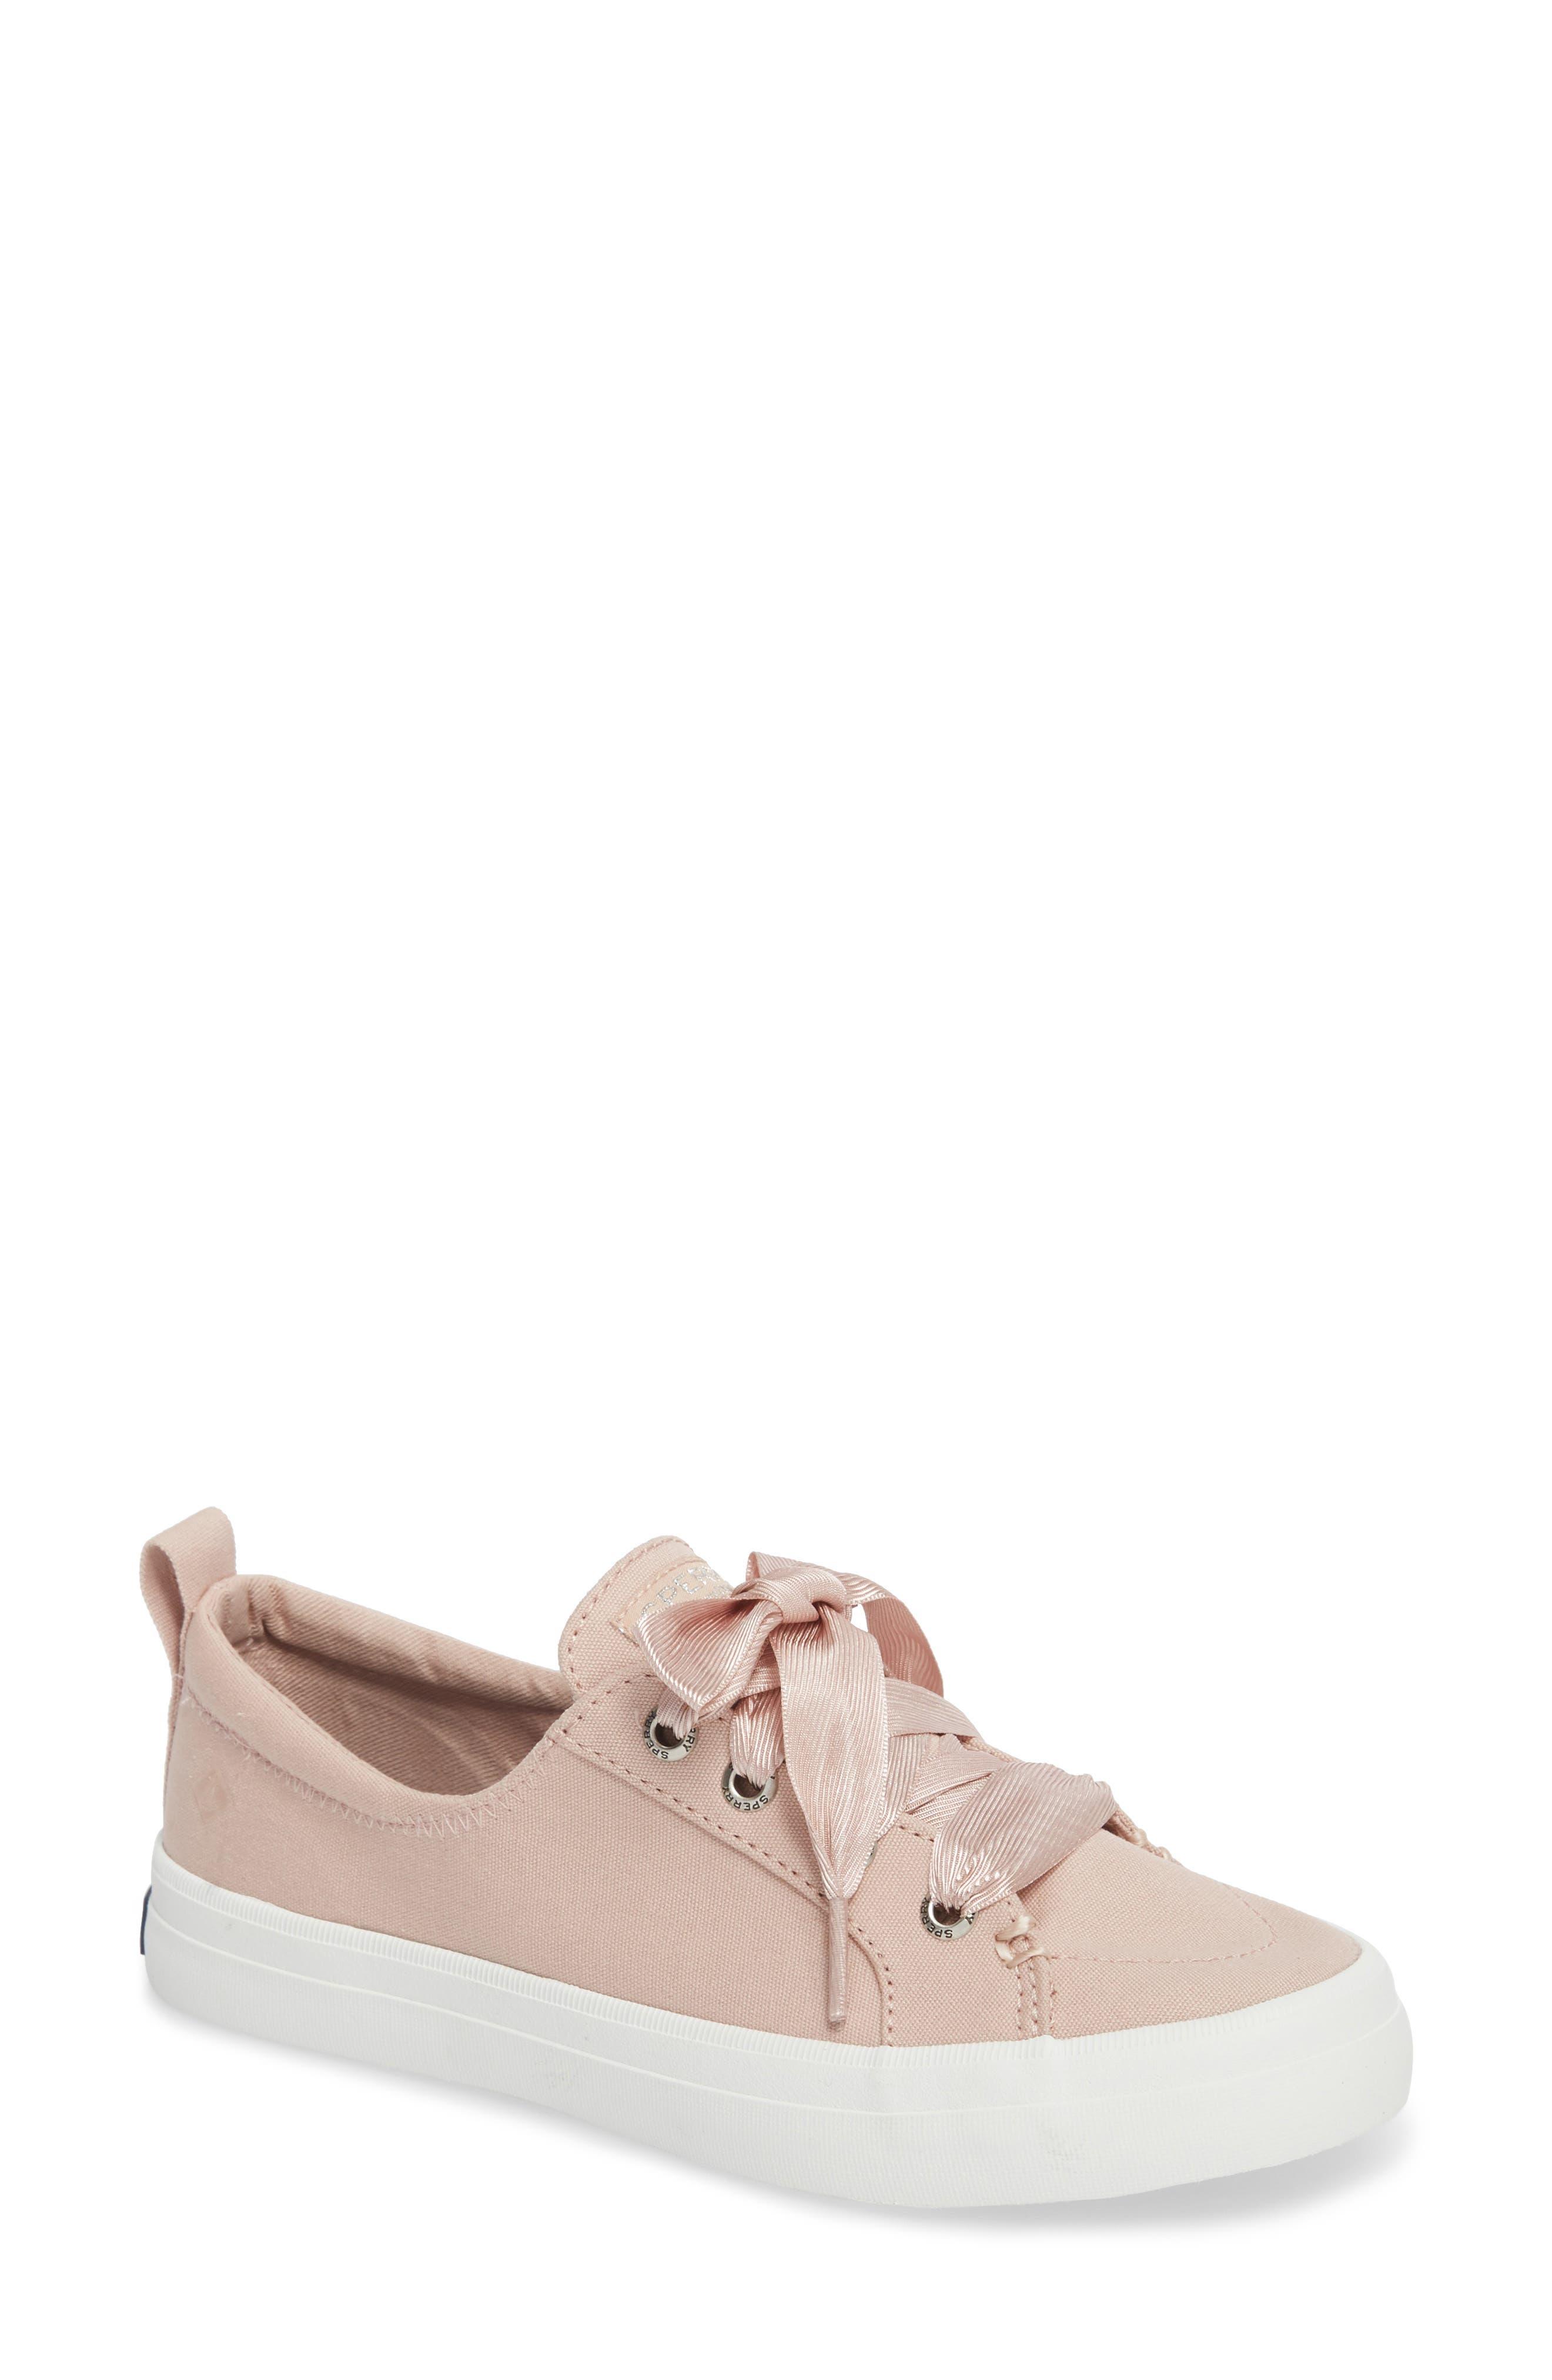 Crest Vibe Satin Lace Sneaker,                             Main thumbnail 1, color,                             Rose Dust Canvas